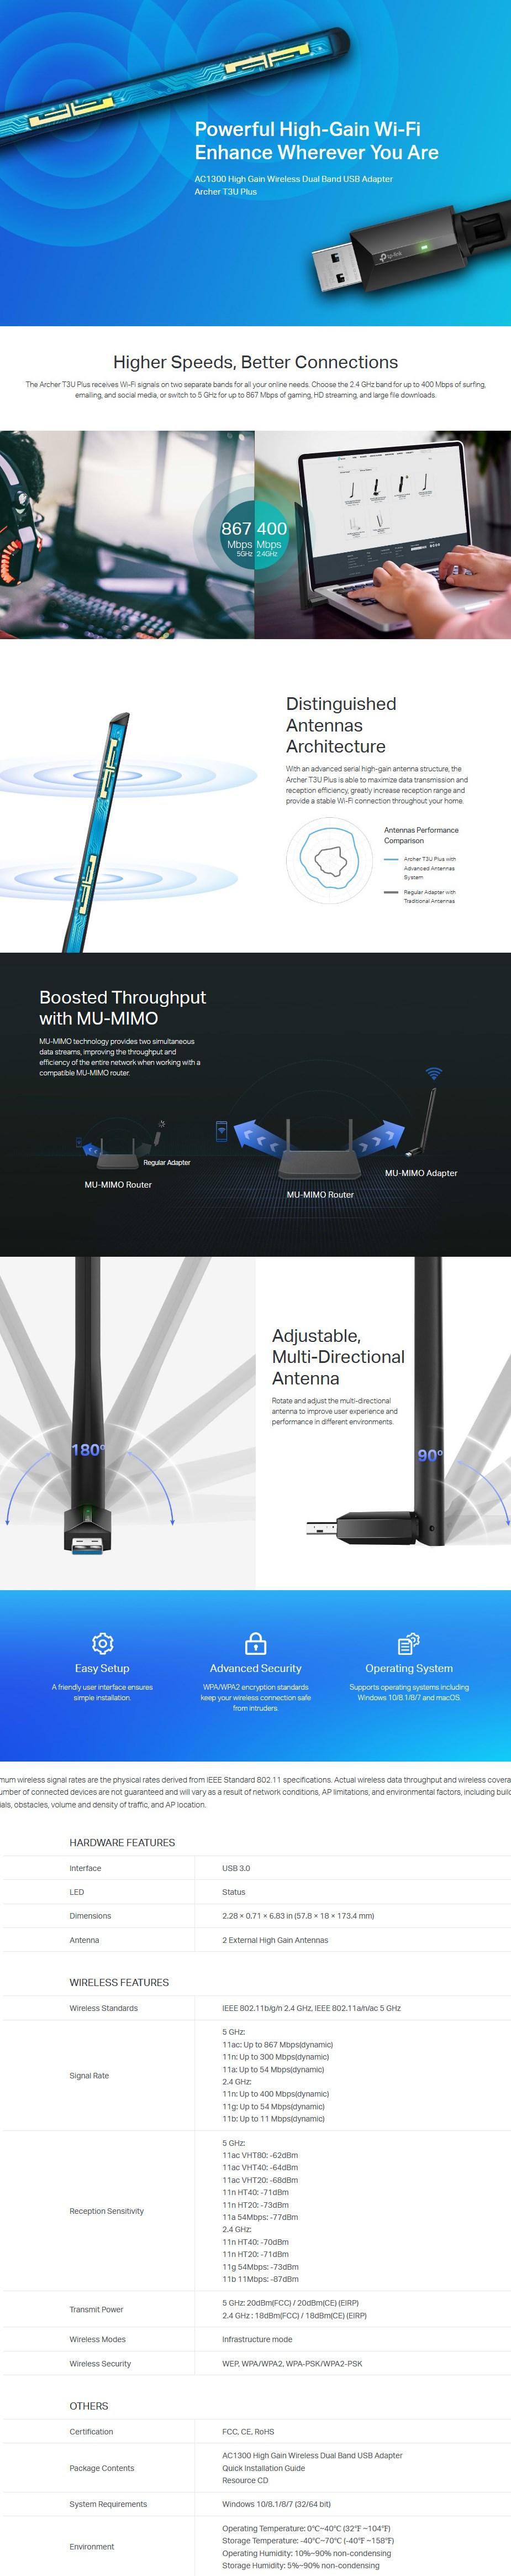 Tp-Link Archer T3U Plus AC1300 High Gain Wireless Dual Band USB Adapter - Desktop Overview 1